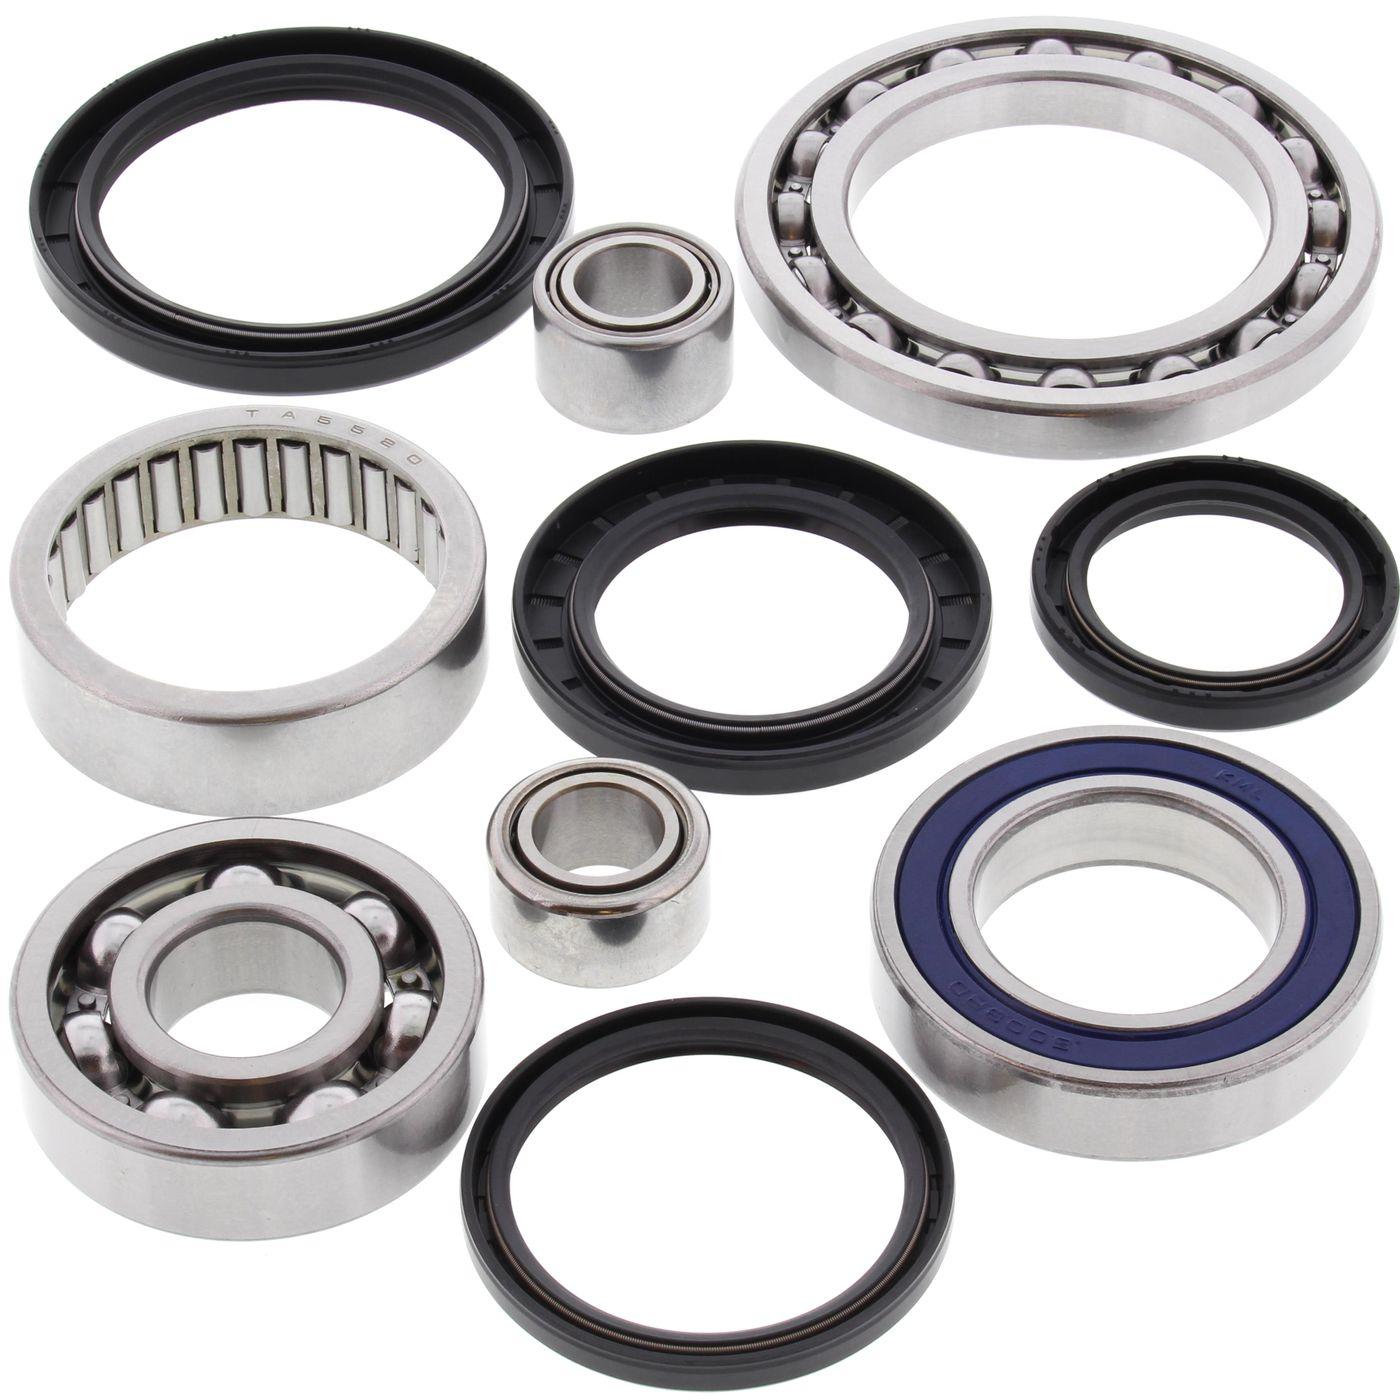 Wrp Diff Bearing & Seal Kits - WRP252030 image